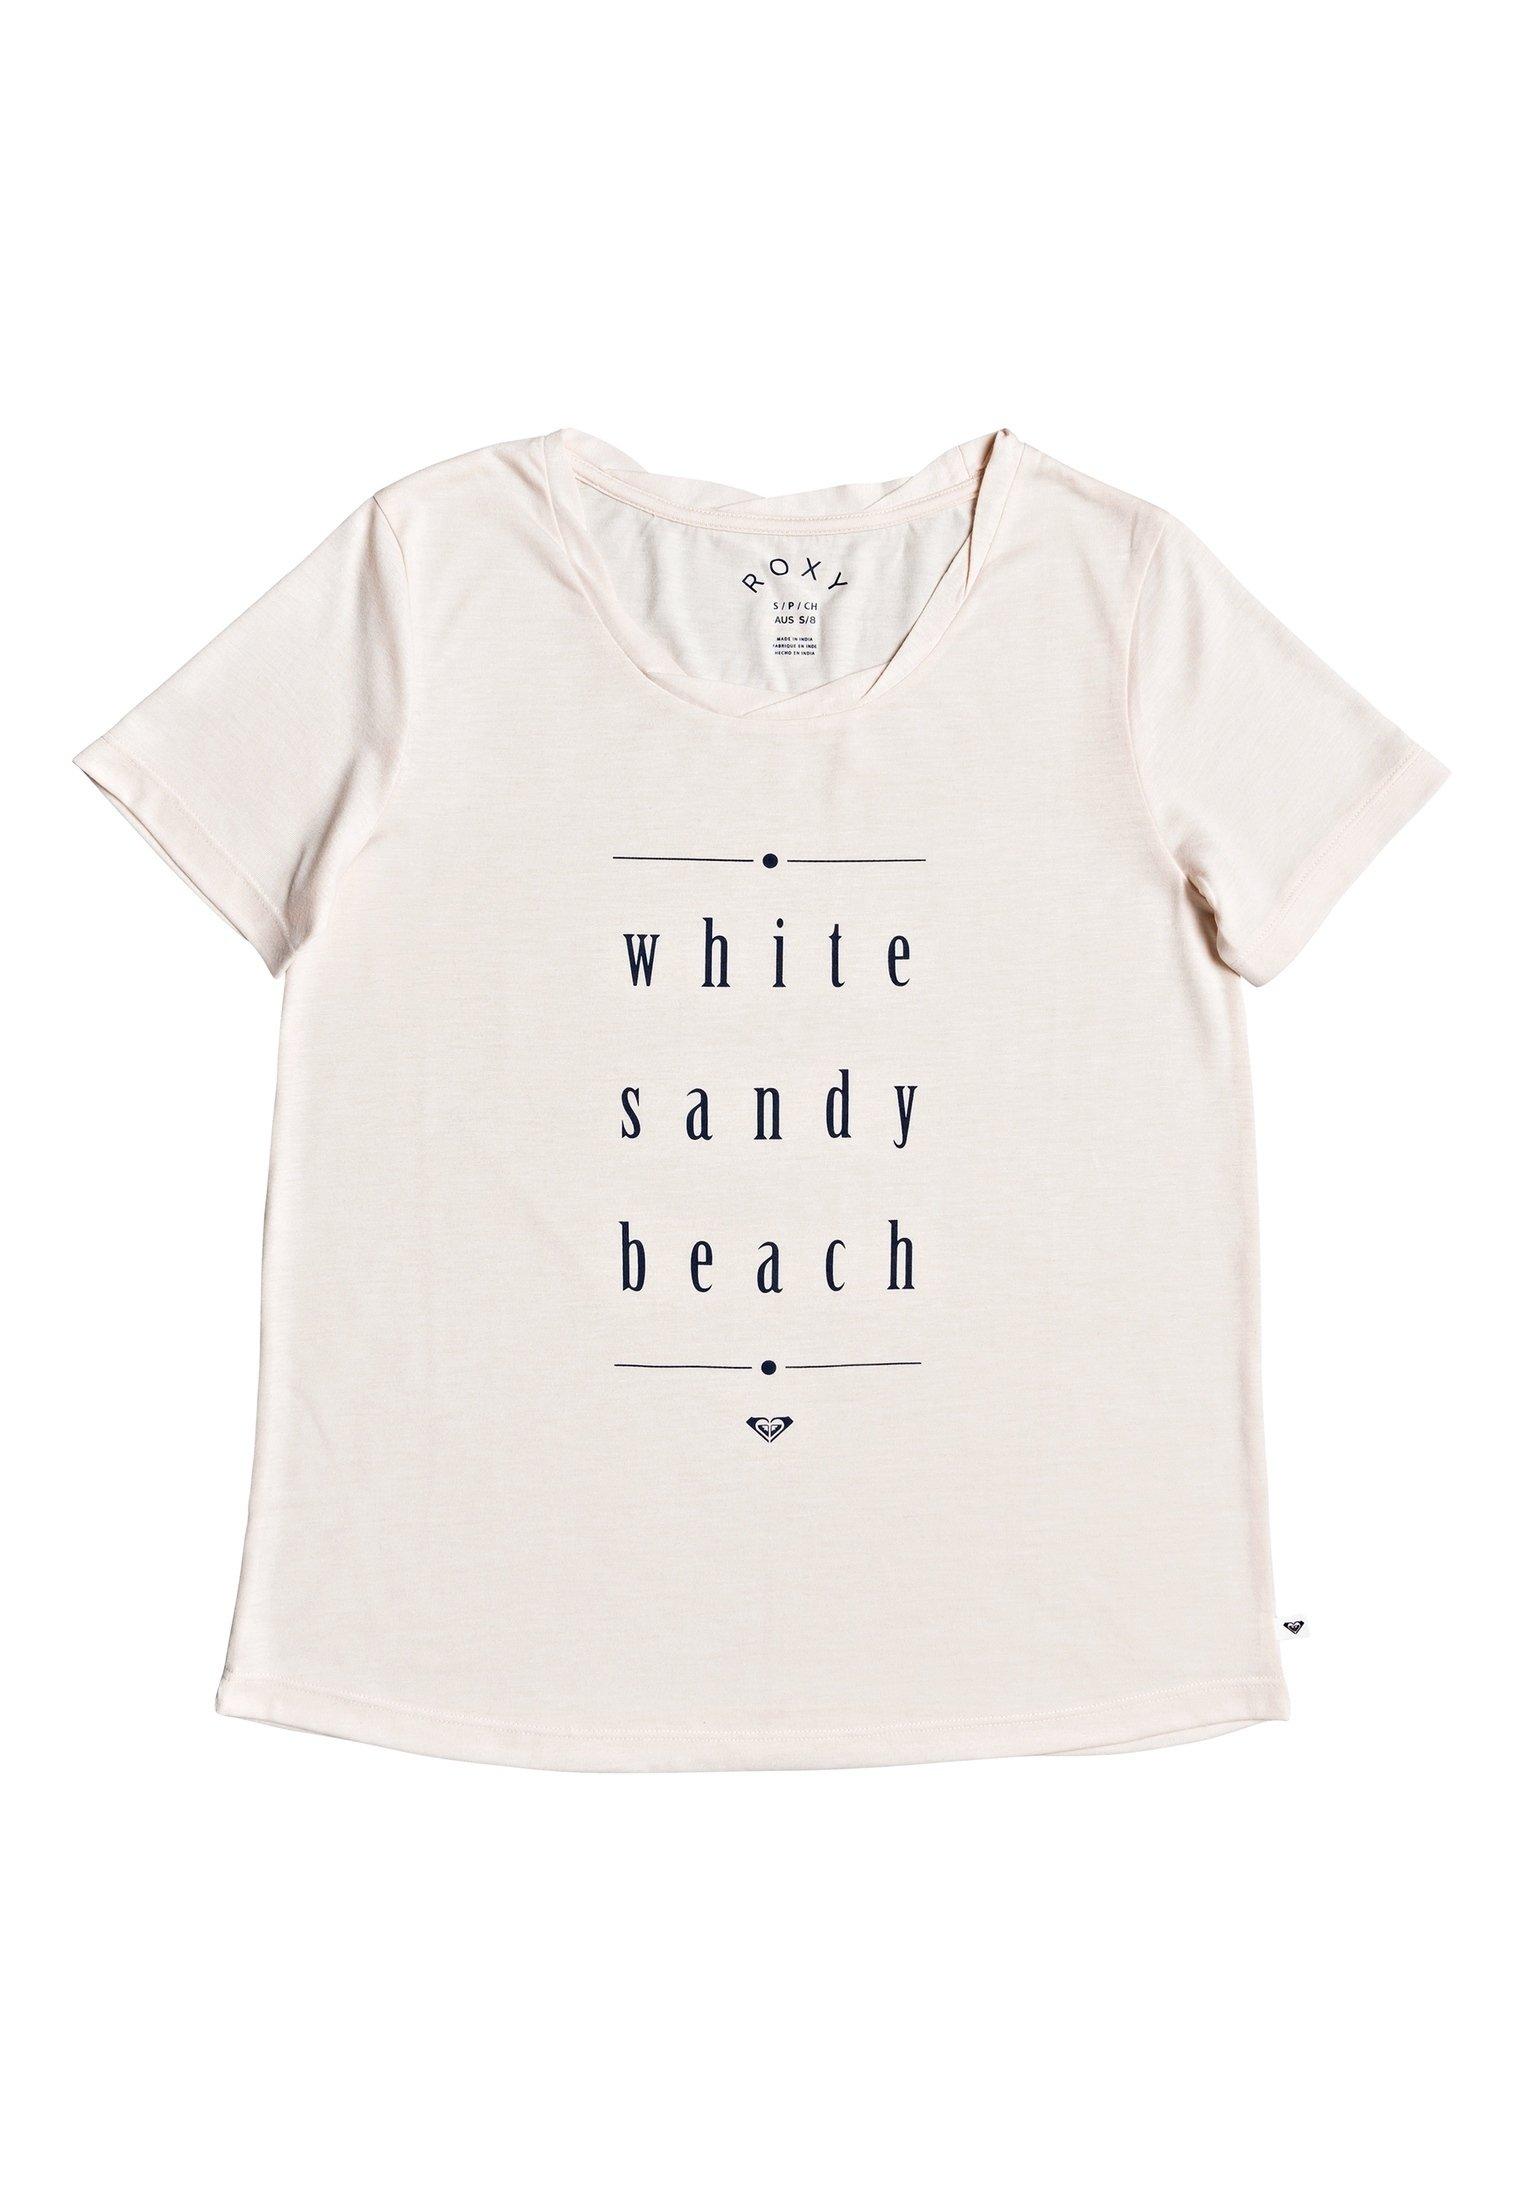 Damen ROXY™ CHASING THE SWELL - T-SHIRT FOR WOMEN ERJZT04795 - T-Shirt print